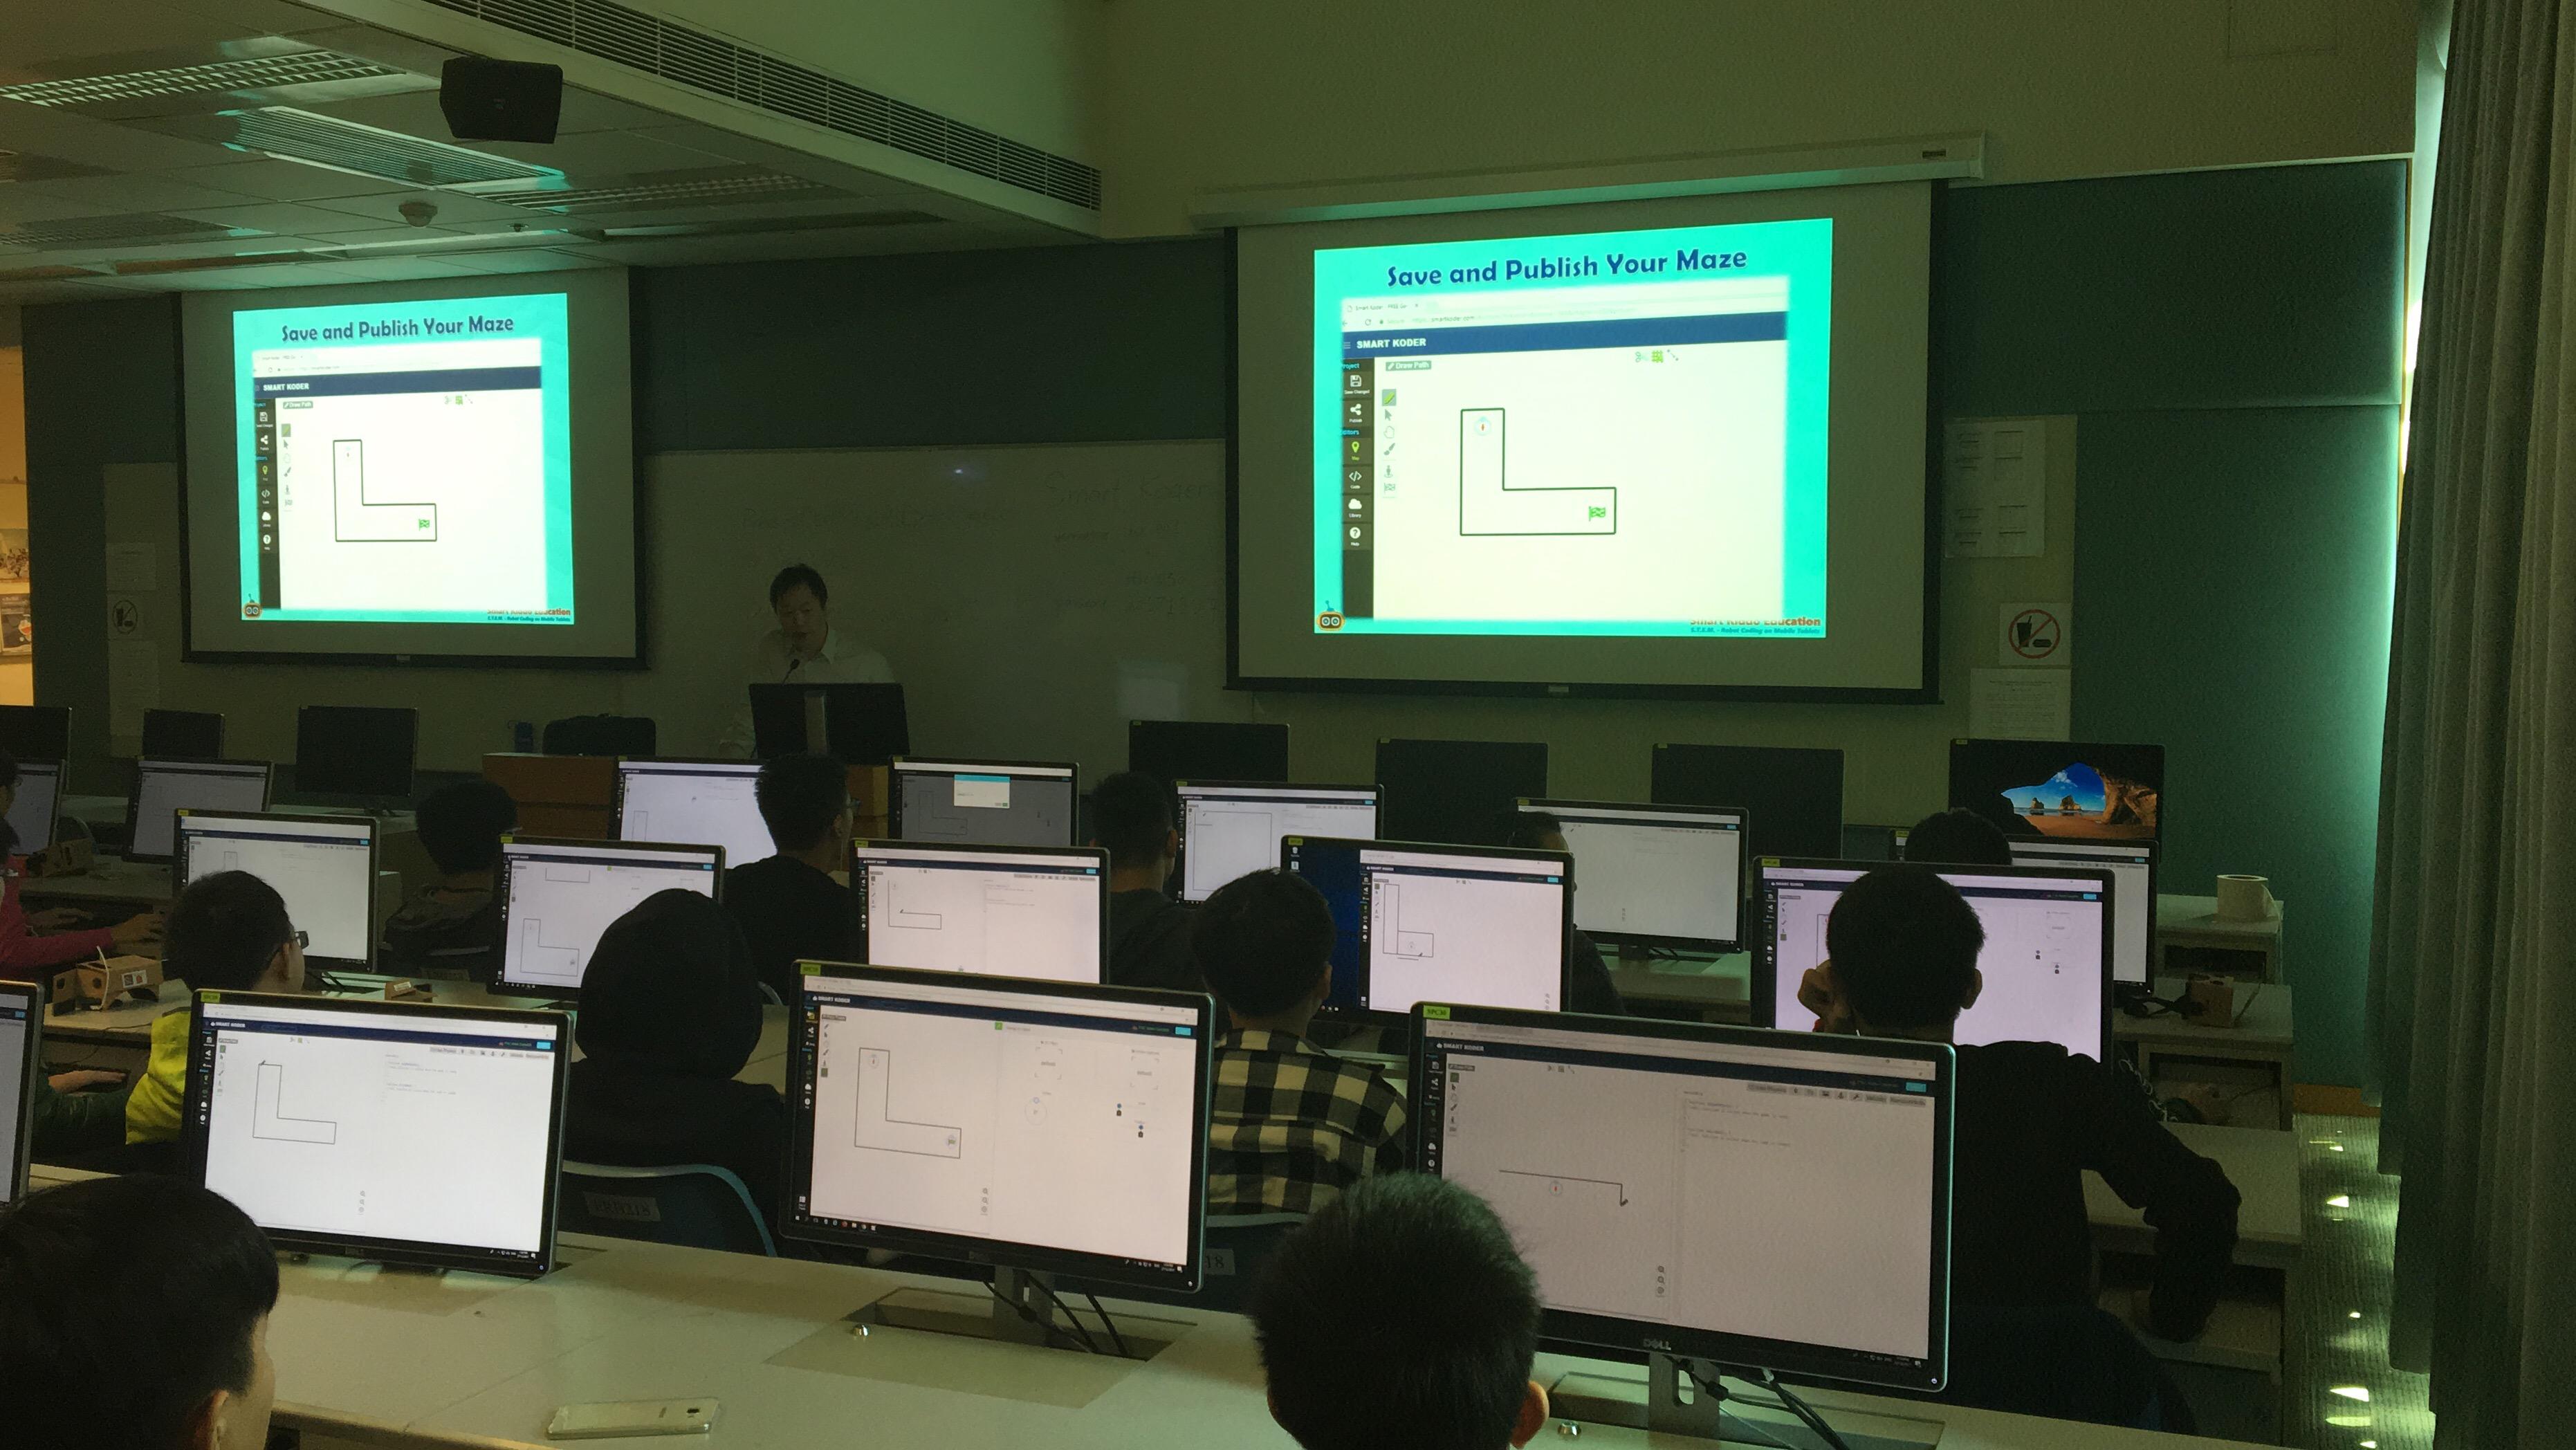 Smart Kiddo - S T E M  Education  Robot Coding courses on